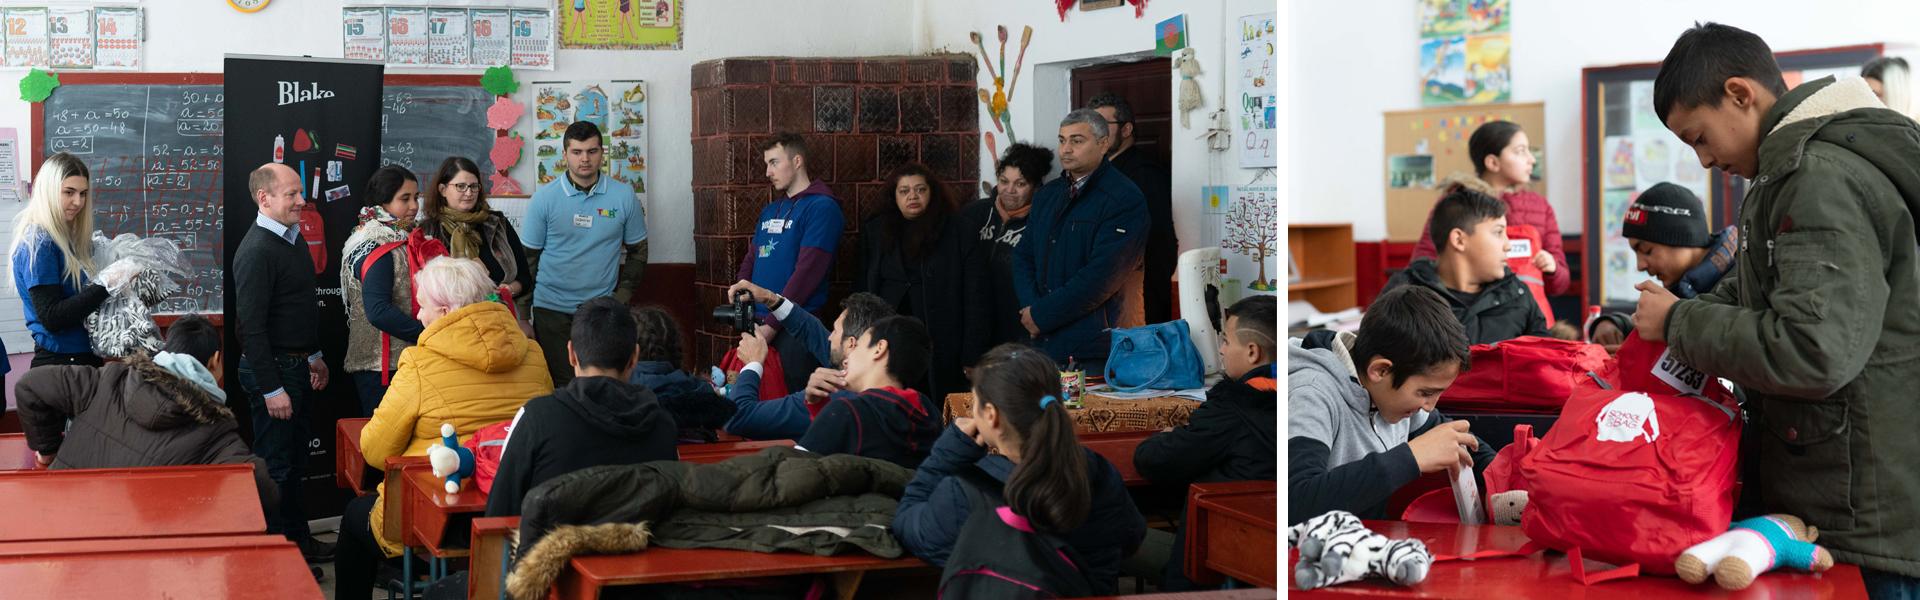 Romania School Gallery 4